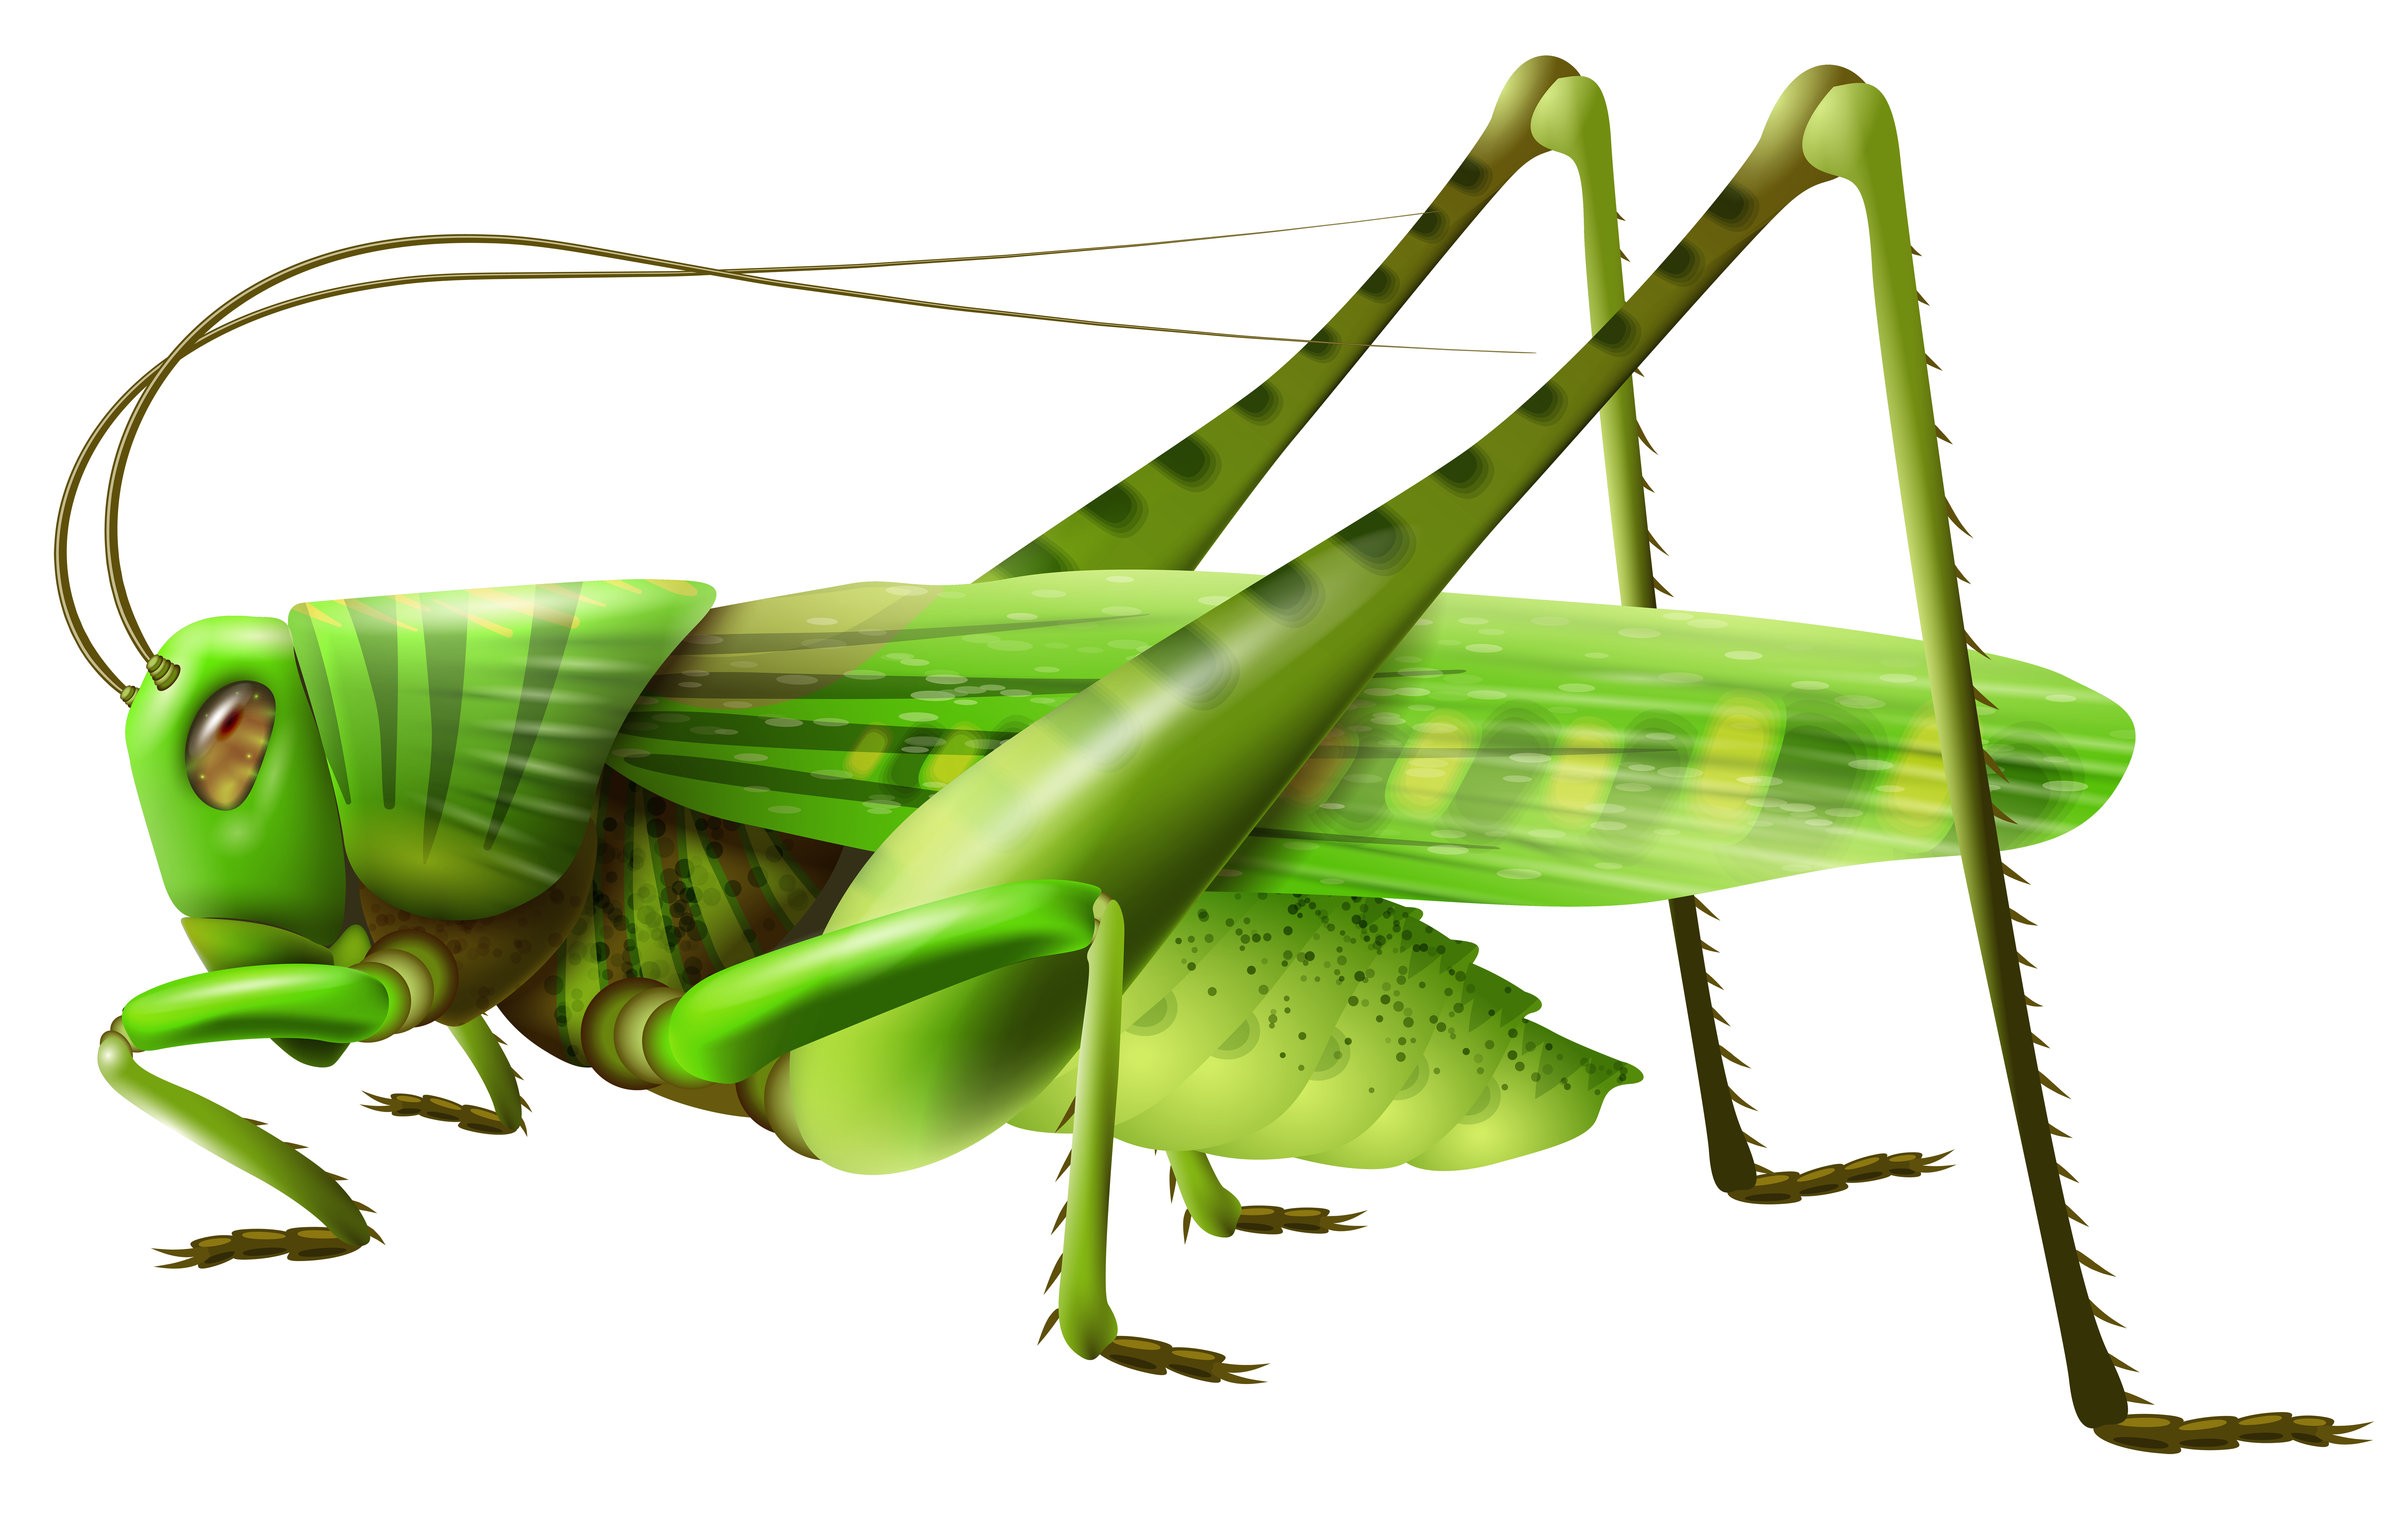 8000x5031 Grasshopper Png Clip Art